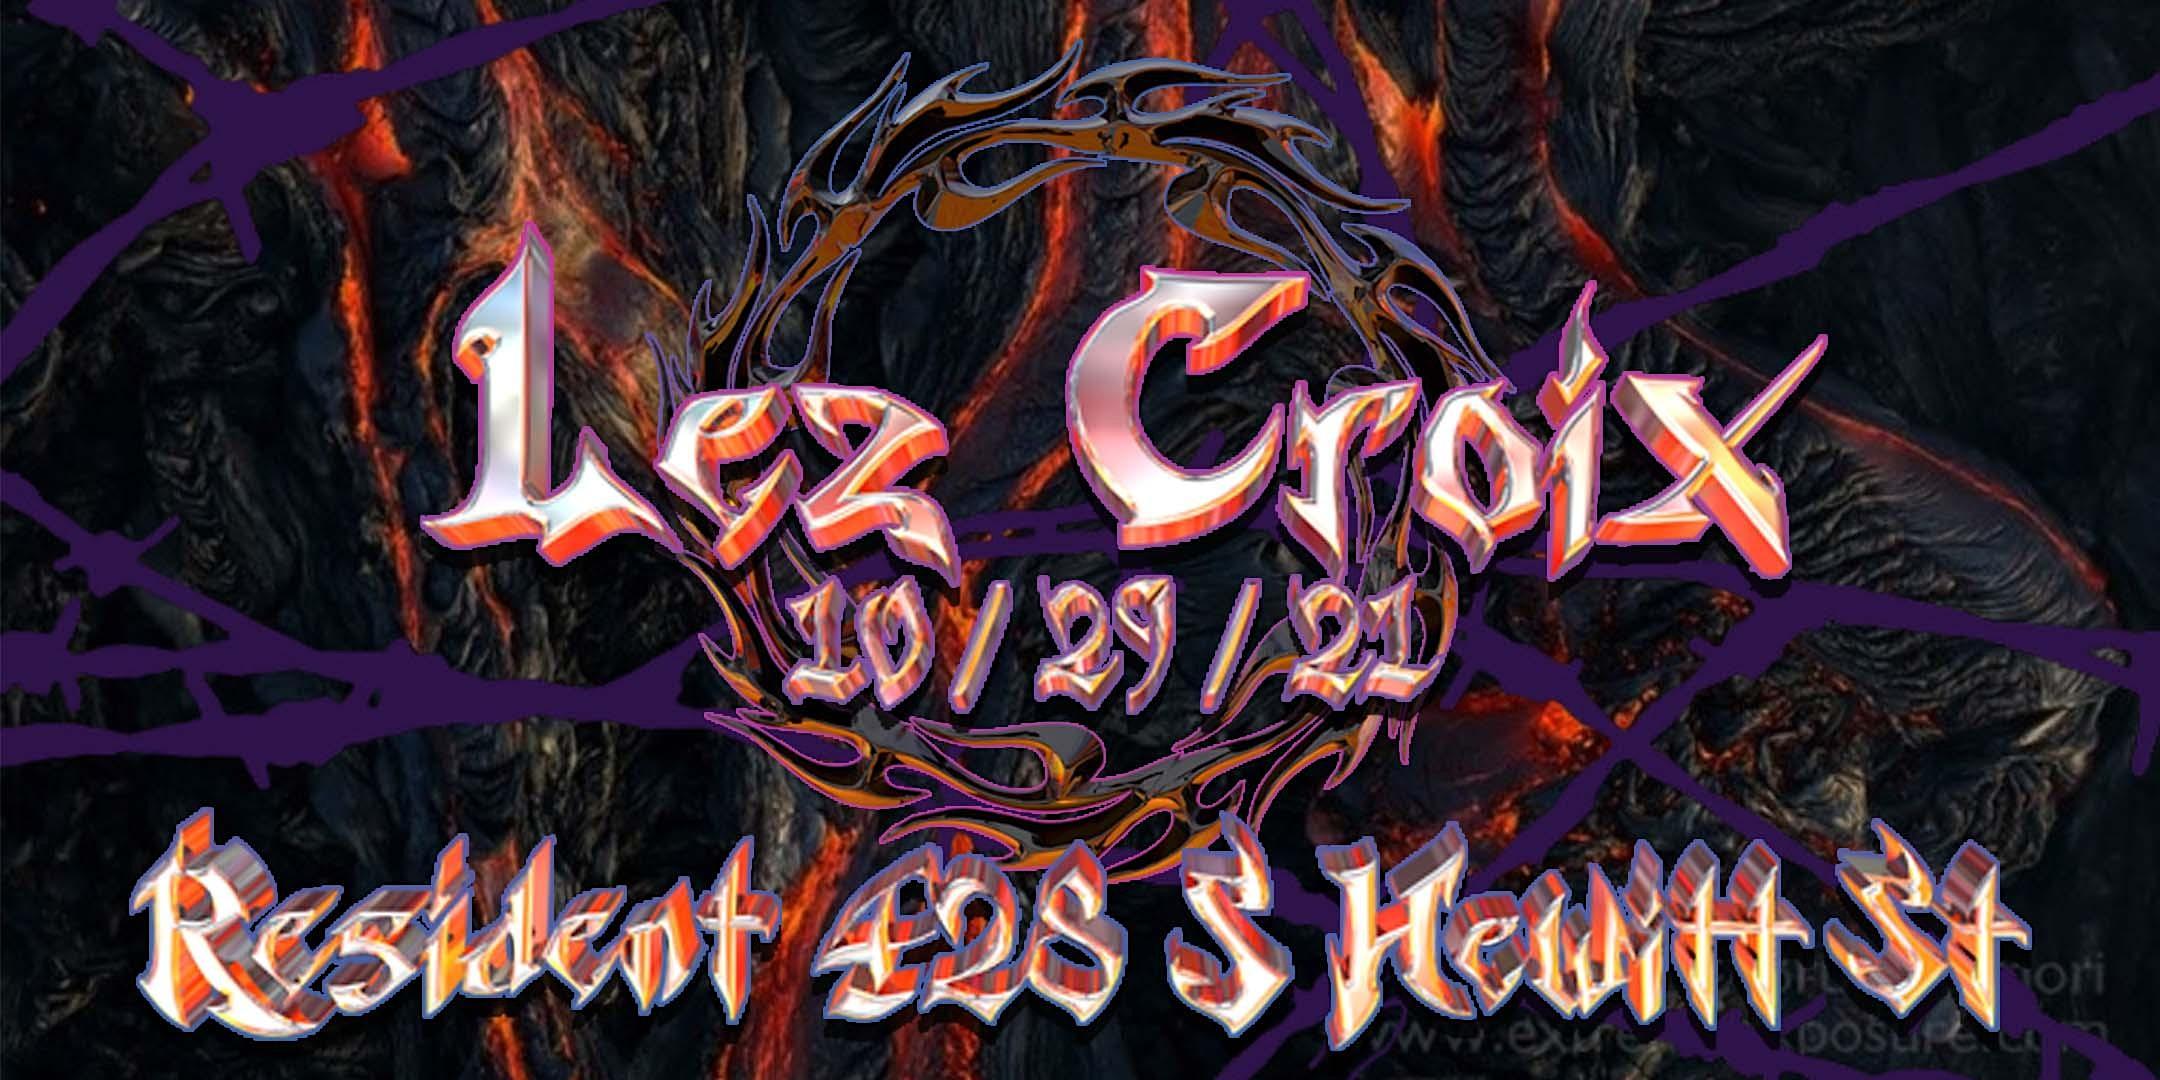 Lez Croix Presents: HELL... YEAH!